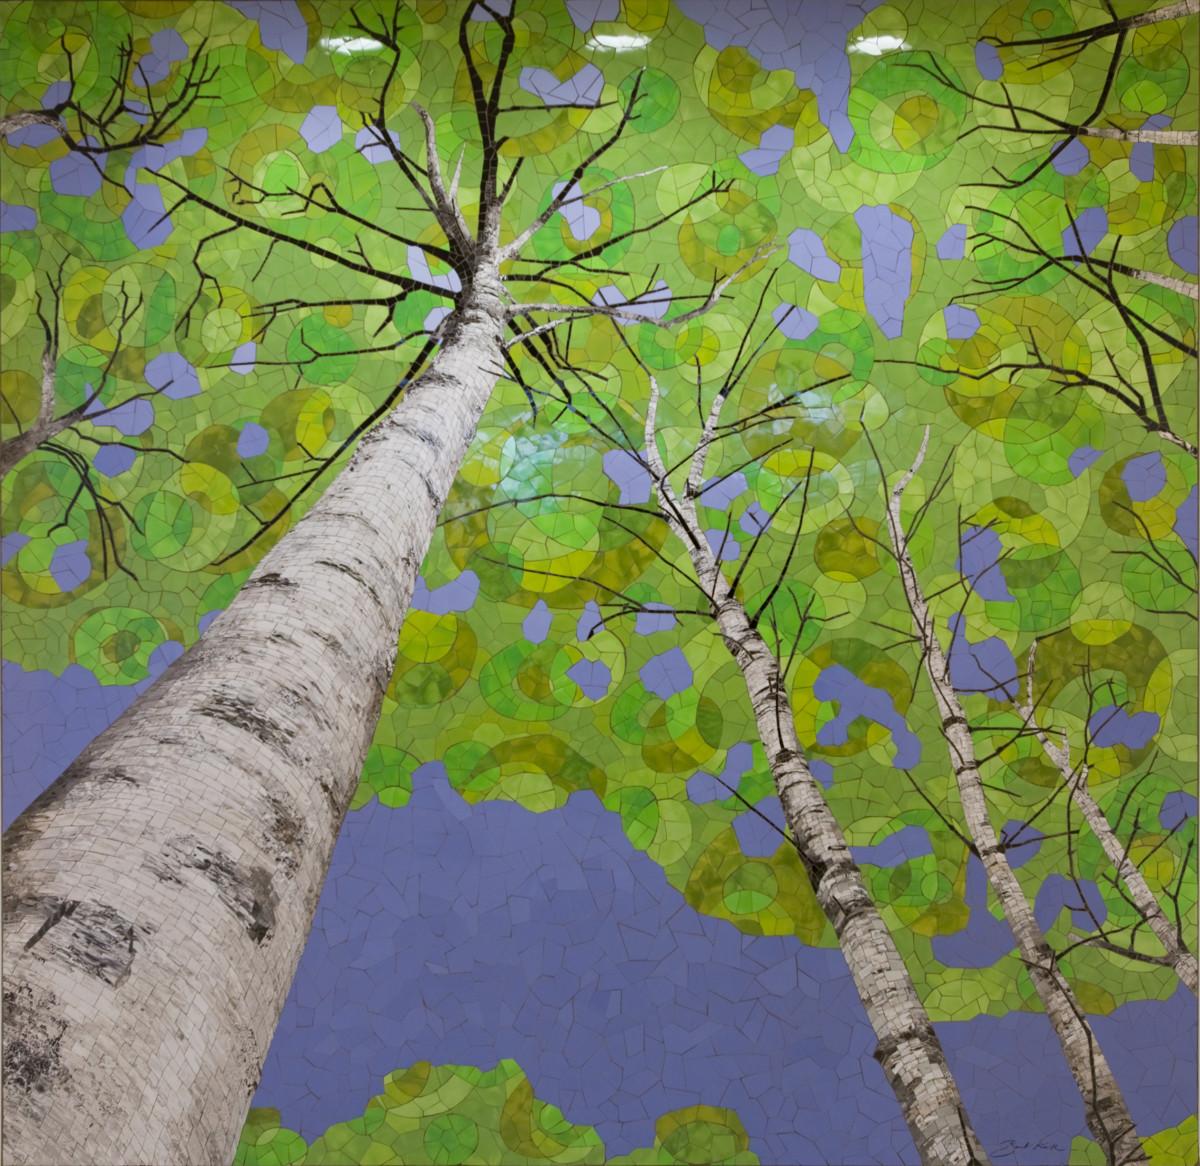 Seasons of Change by Barbara Benson Keith